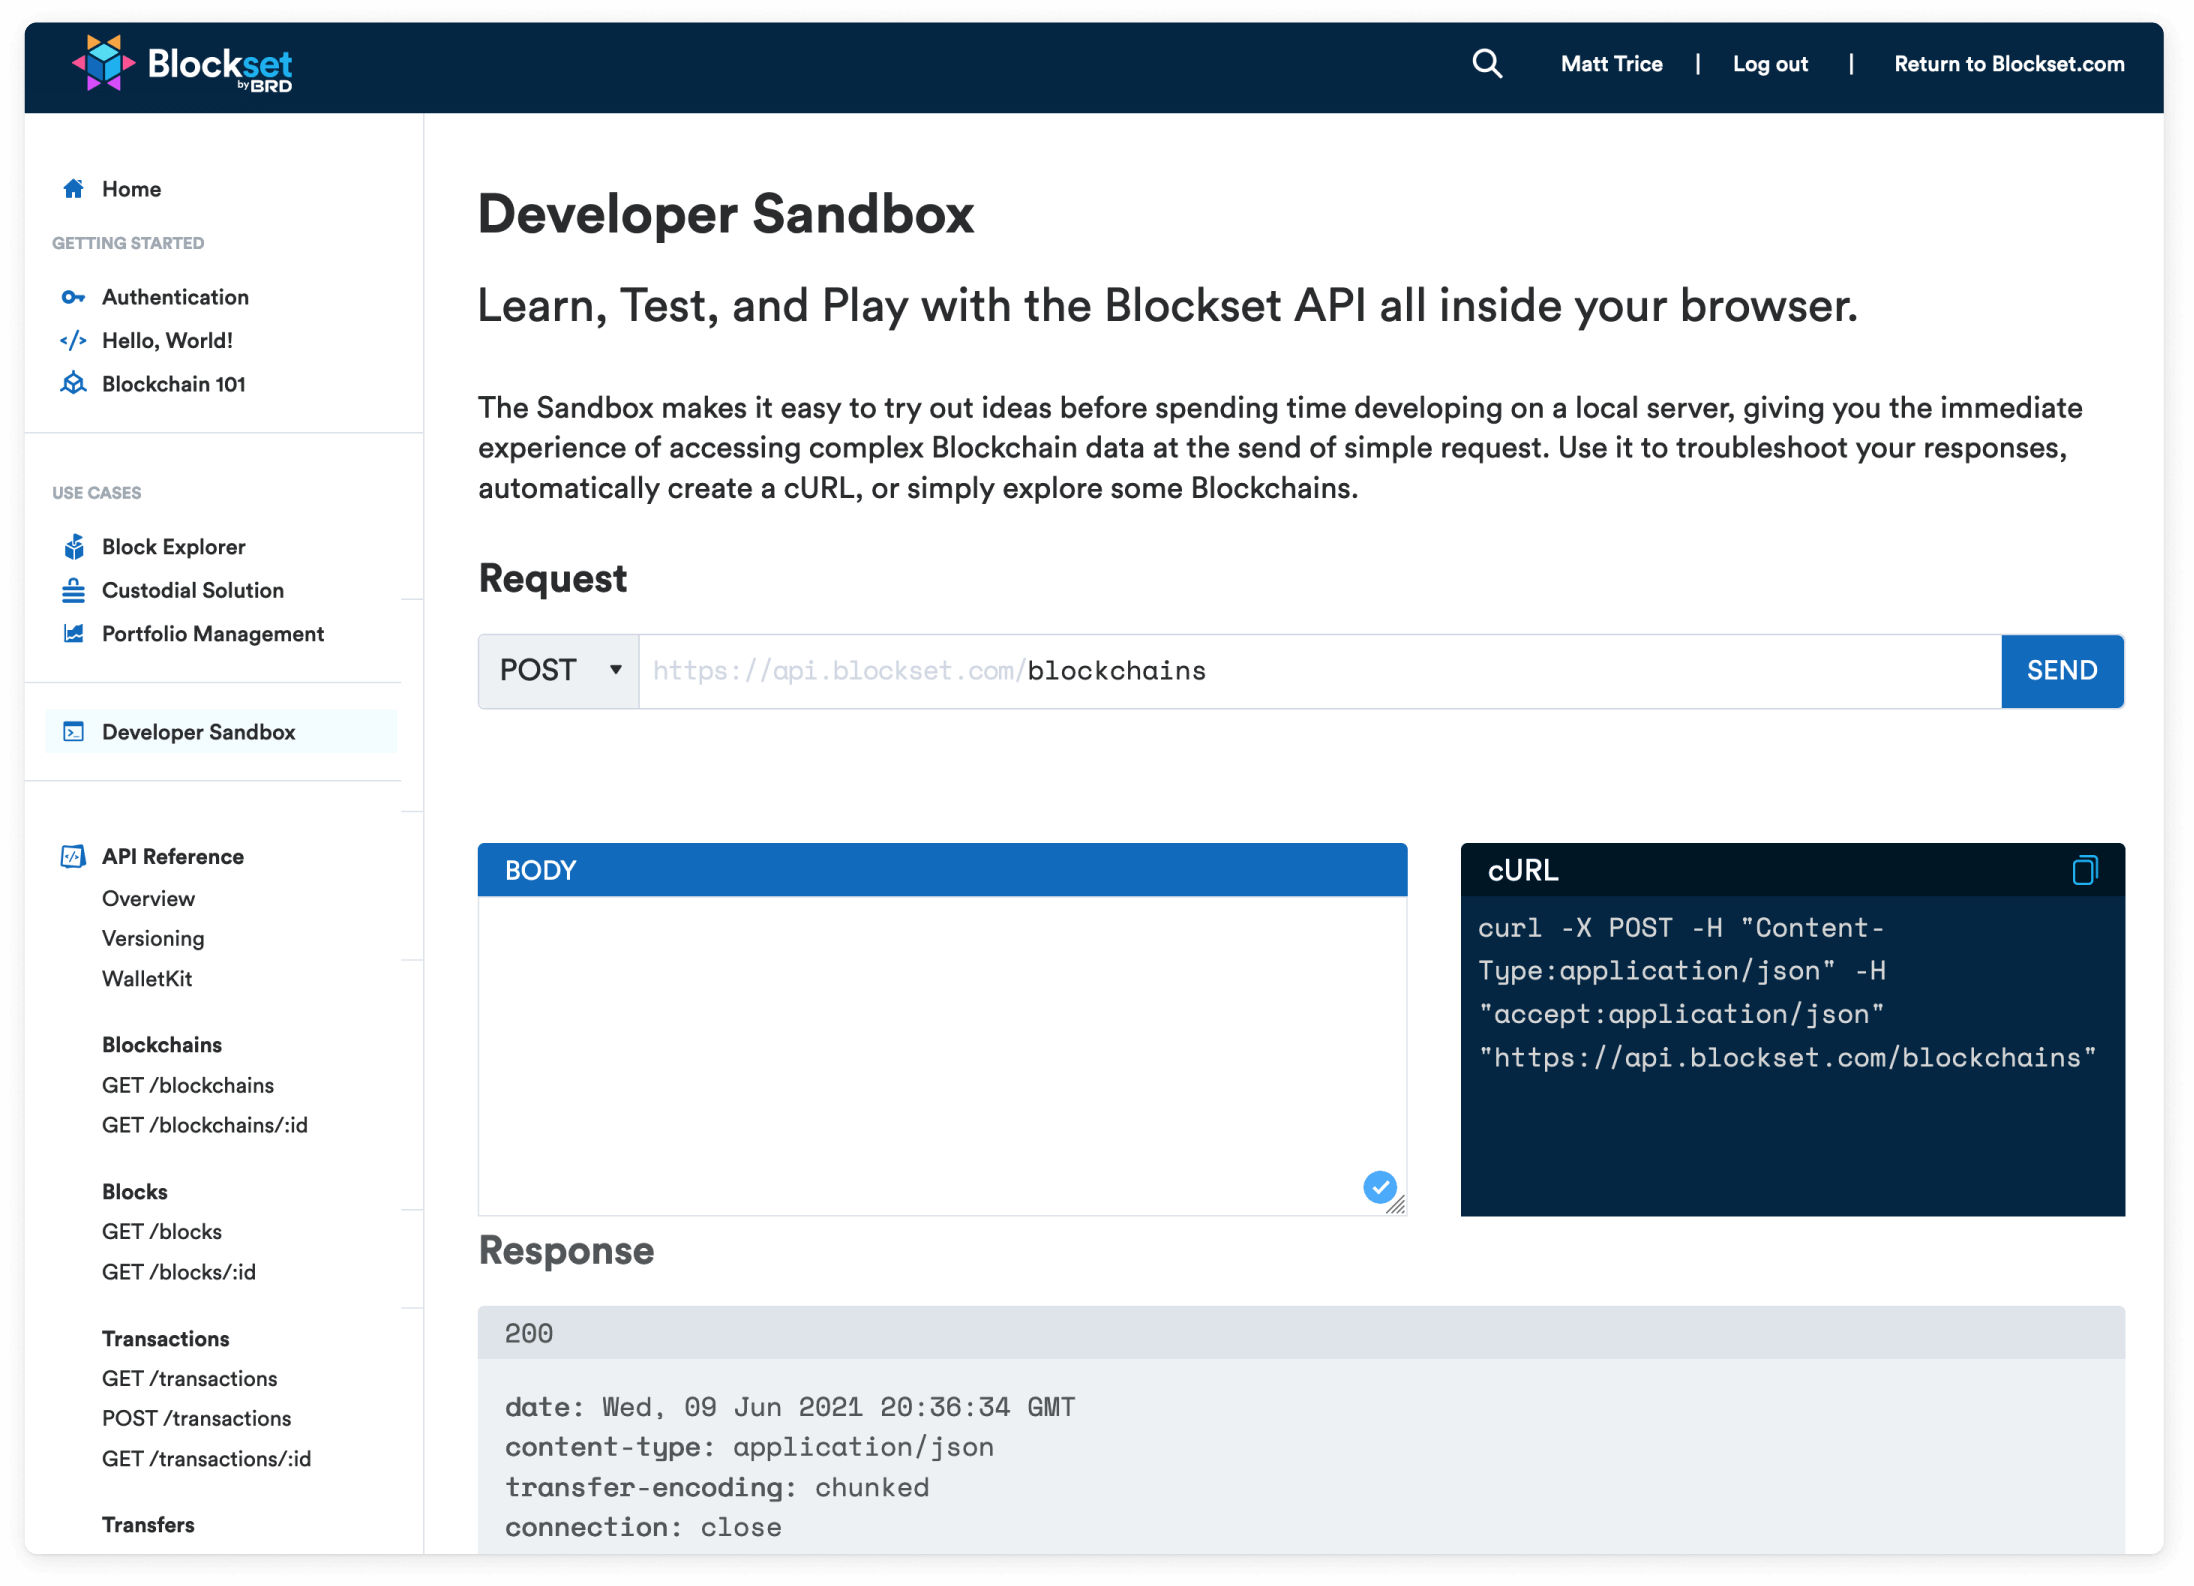 Blockset Developer Sandbox interface